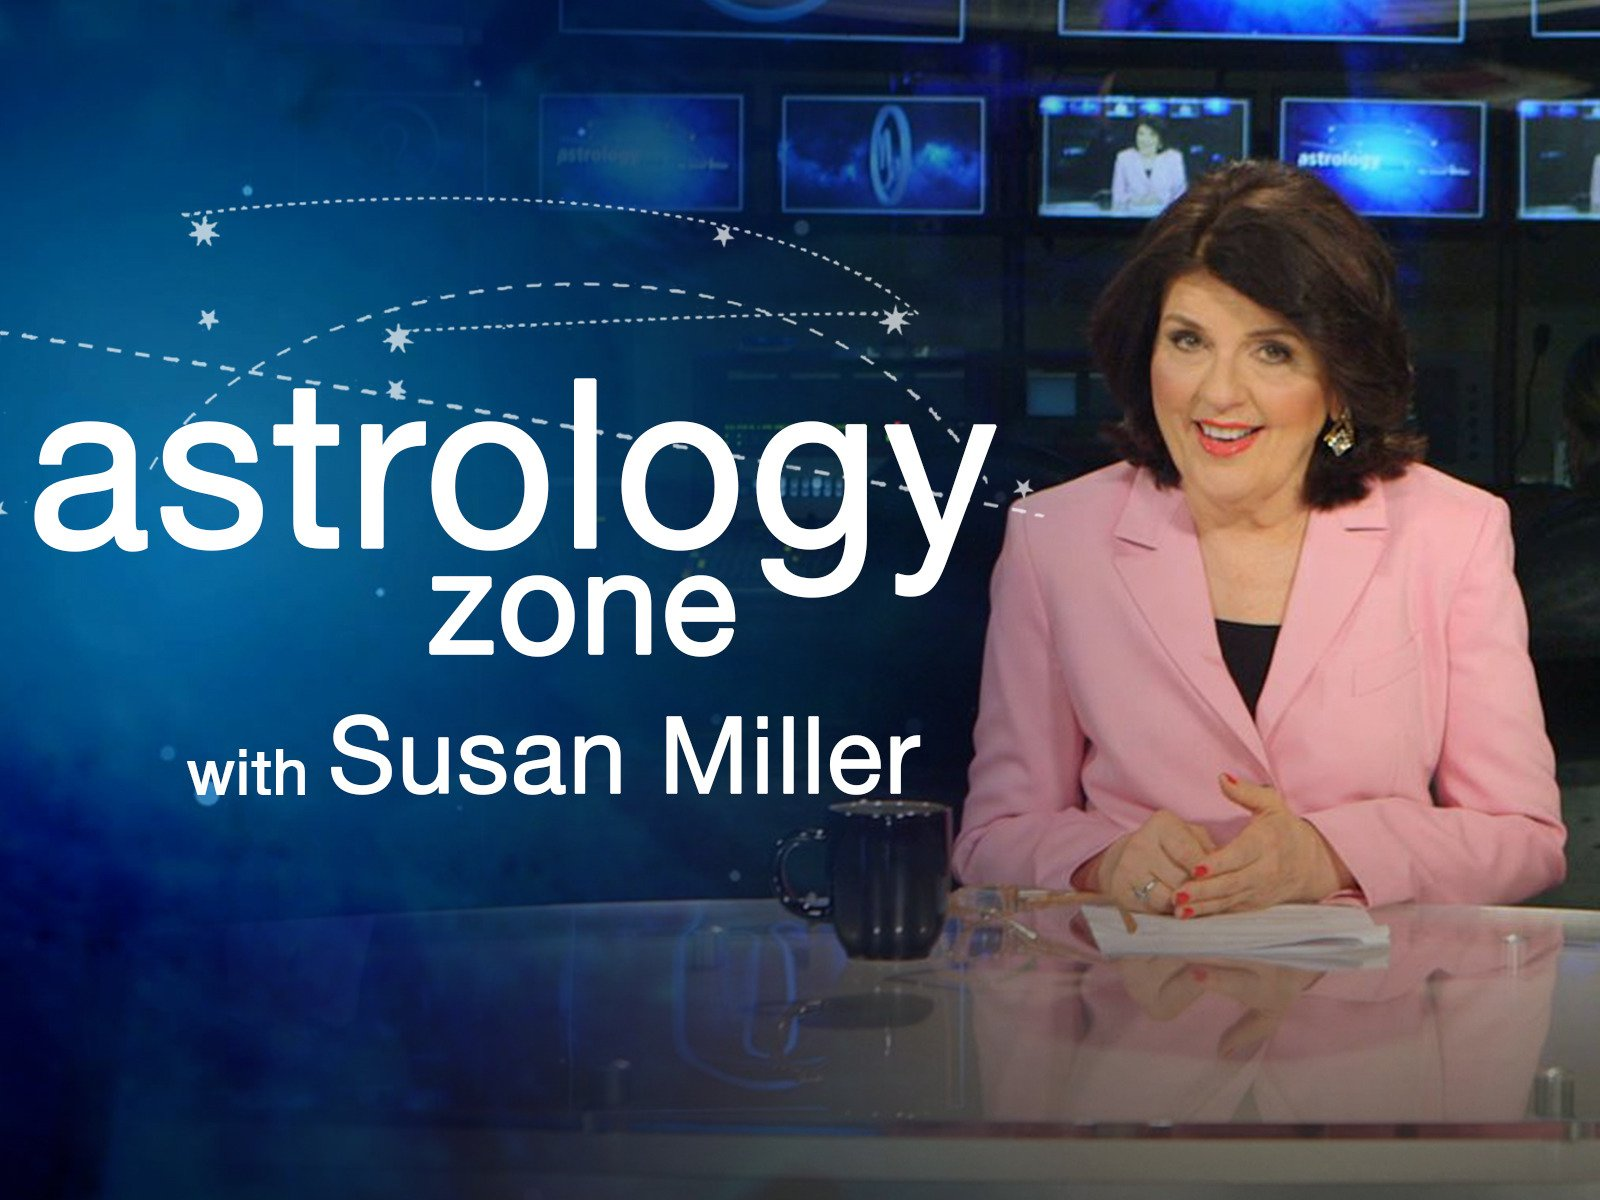 susan miller astrology book